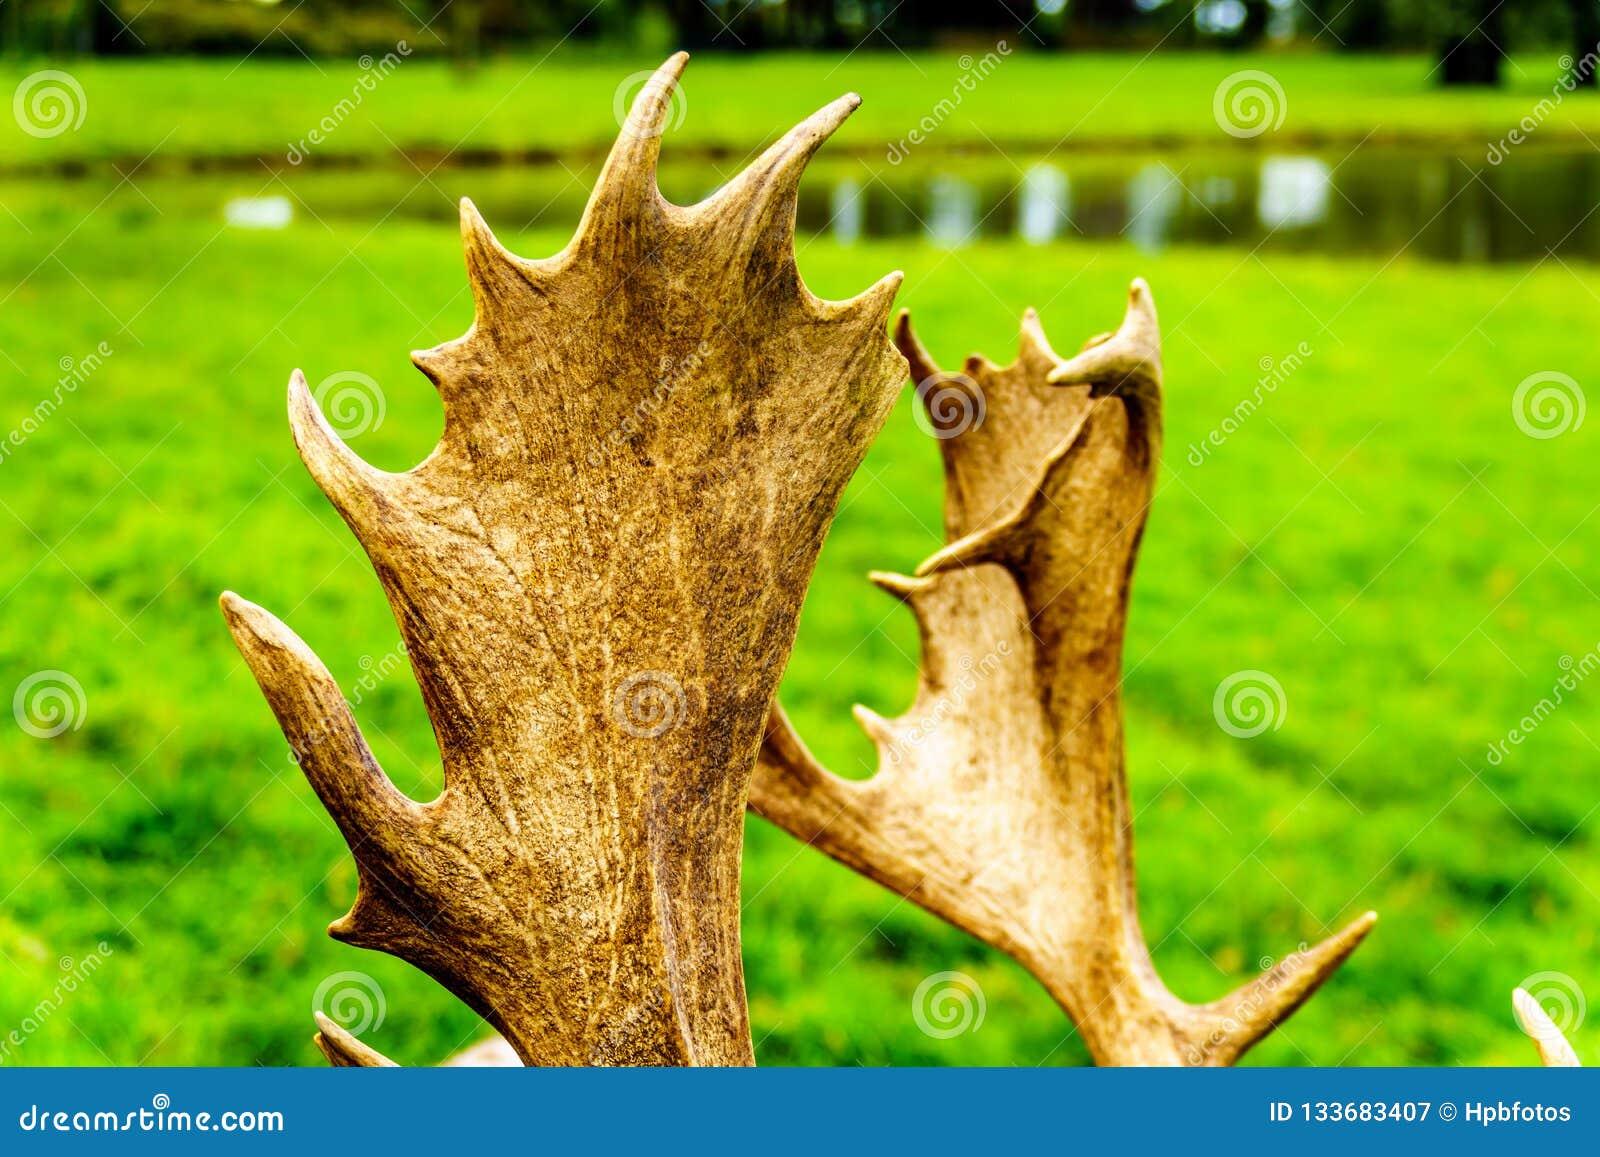 Закройте вверх Antlers лани